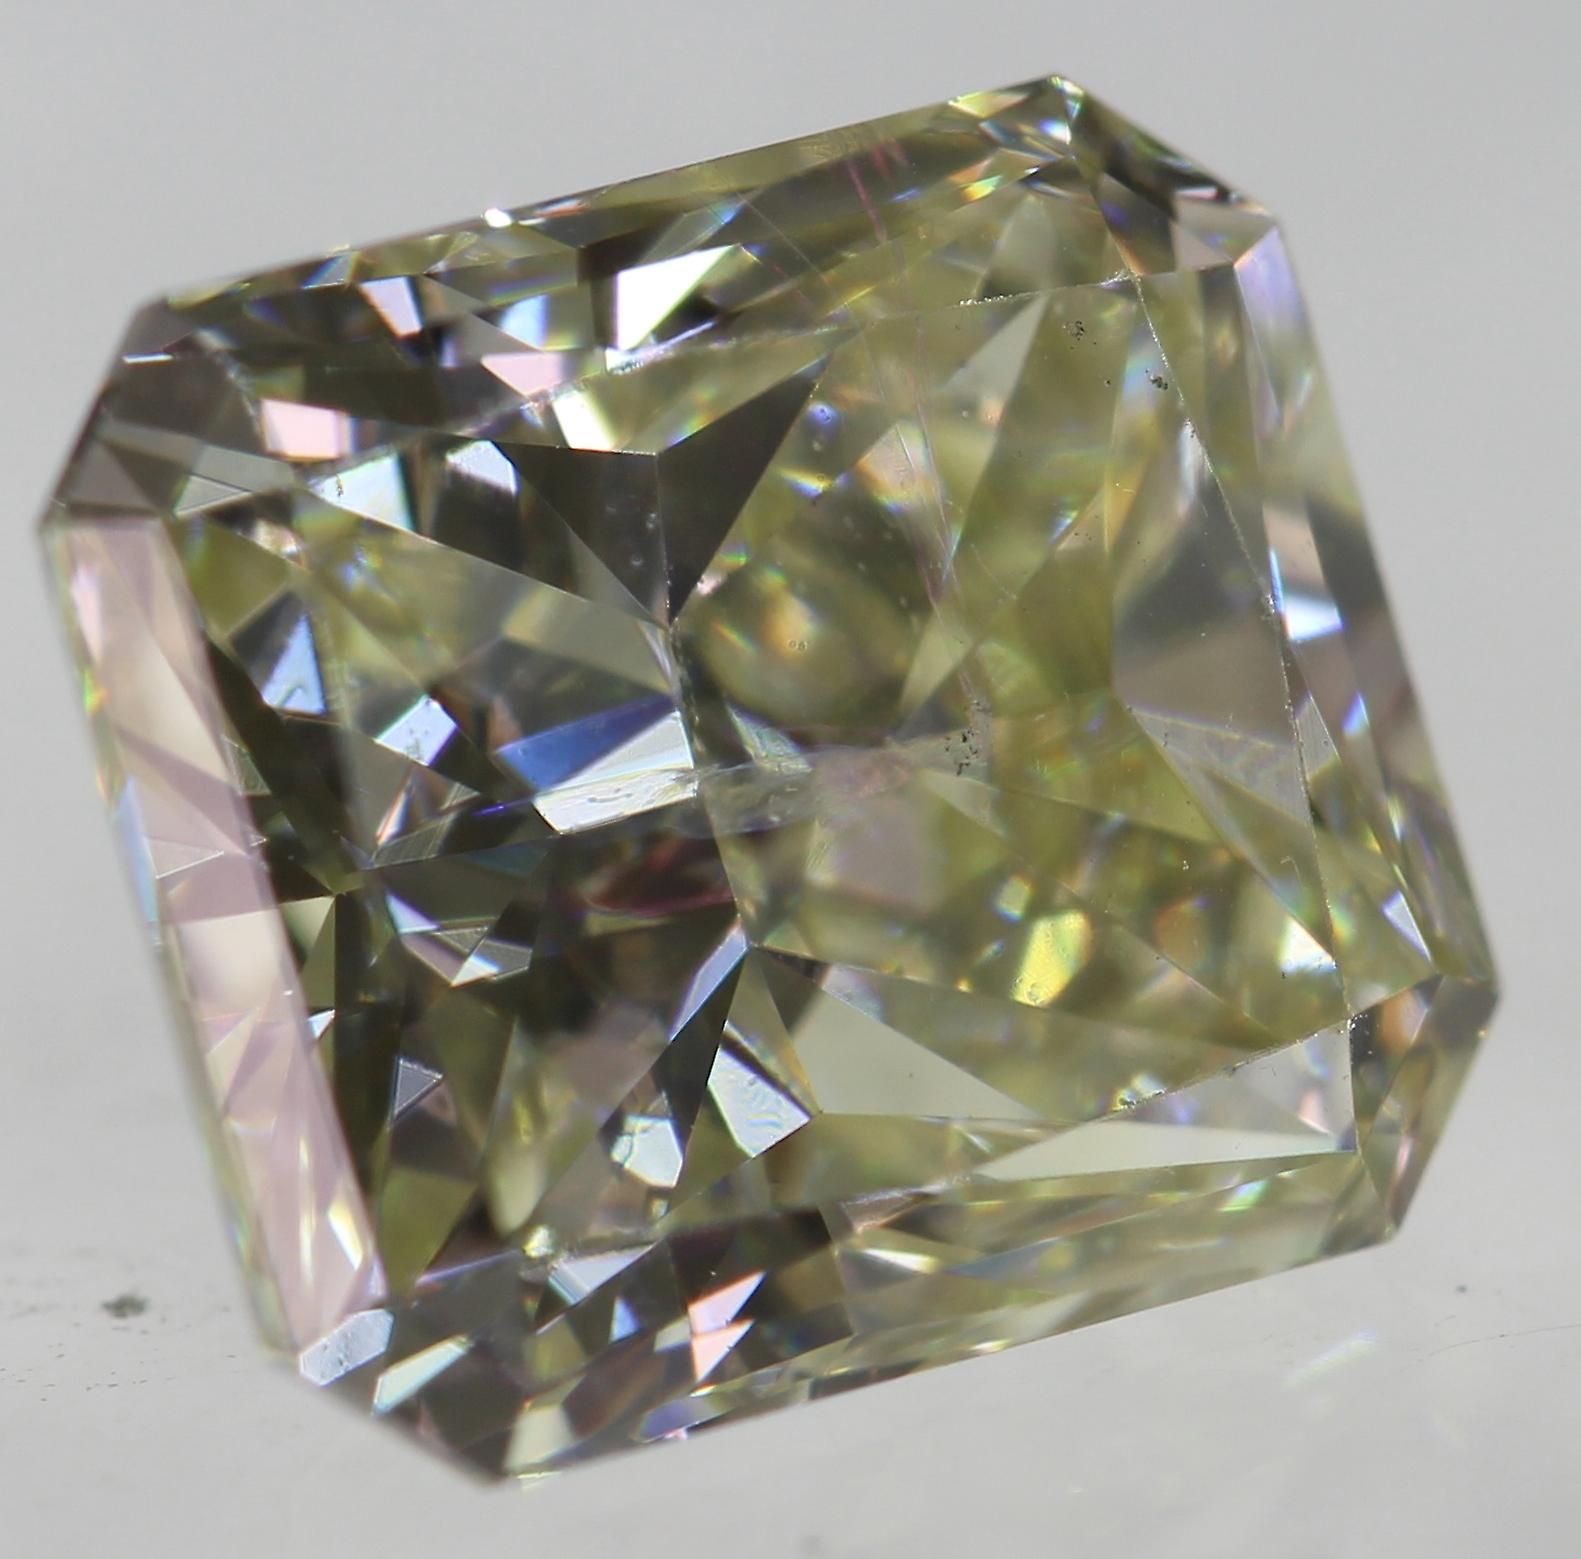 Certified 1.26 Carat J VVS2 Radiant Enhanced Natural Loose Diamond 6.46X5.69mm